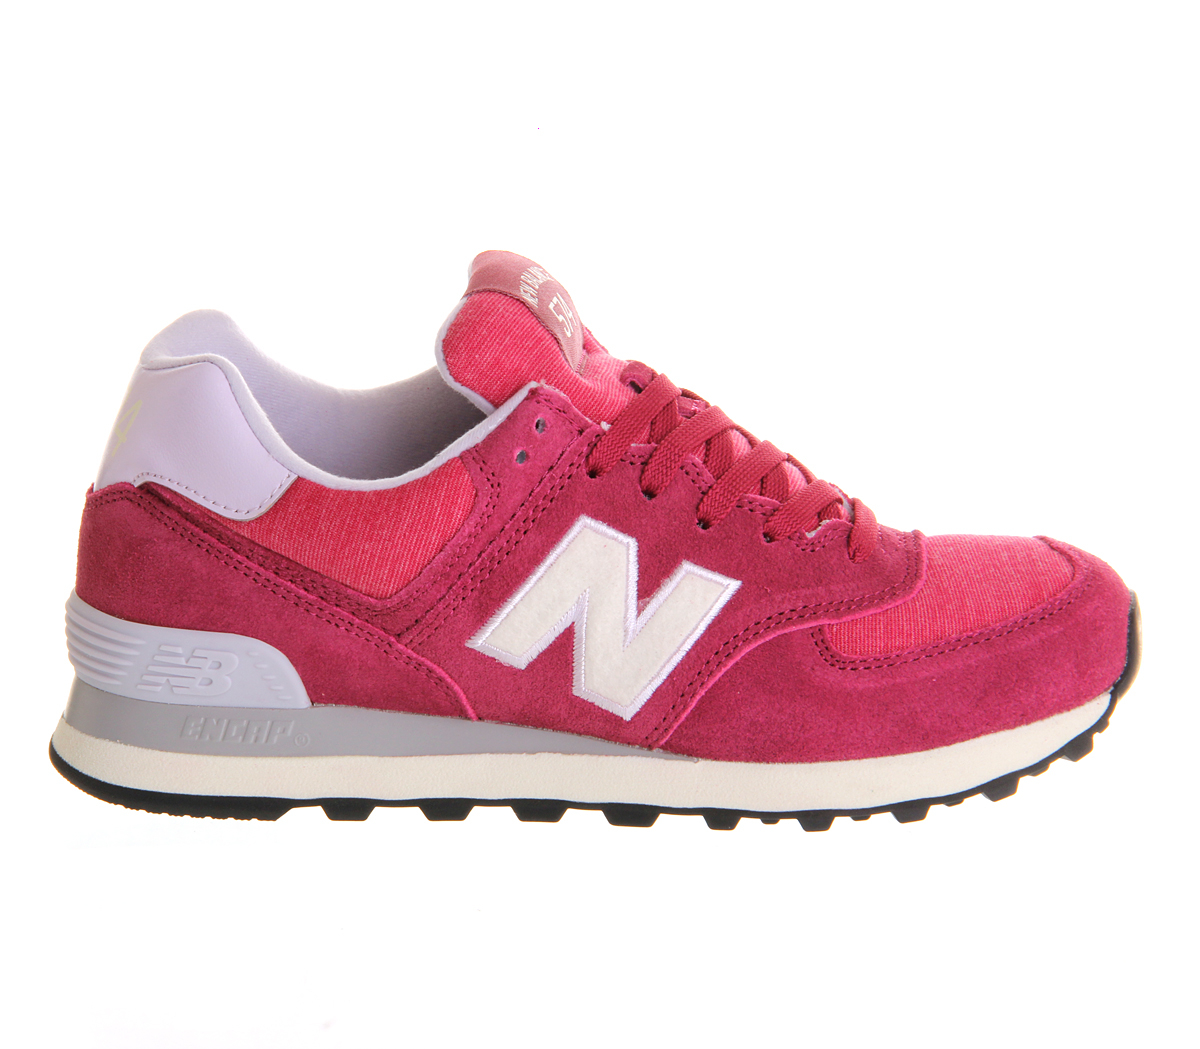 New Balance Wl574 in Fuschia (Pink) - Lyst